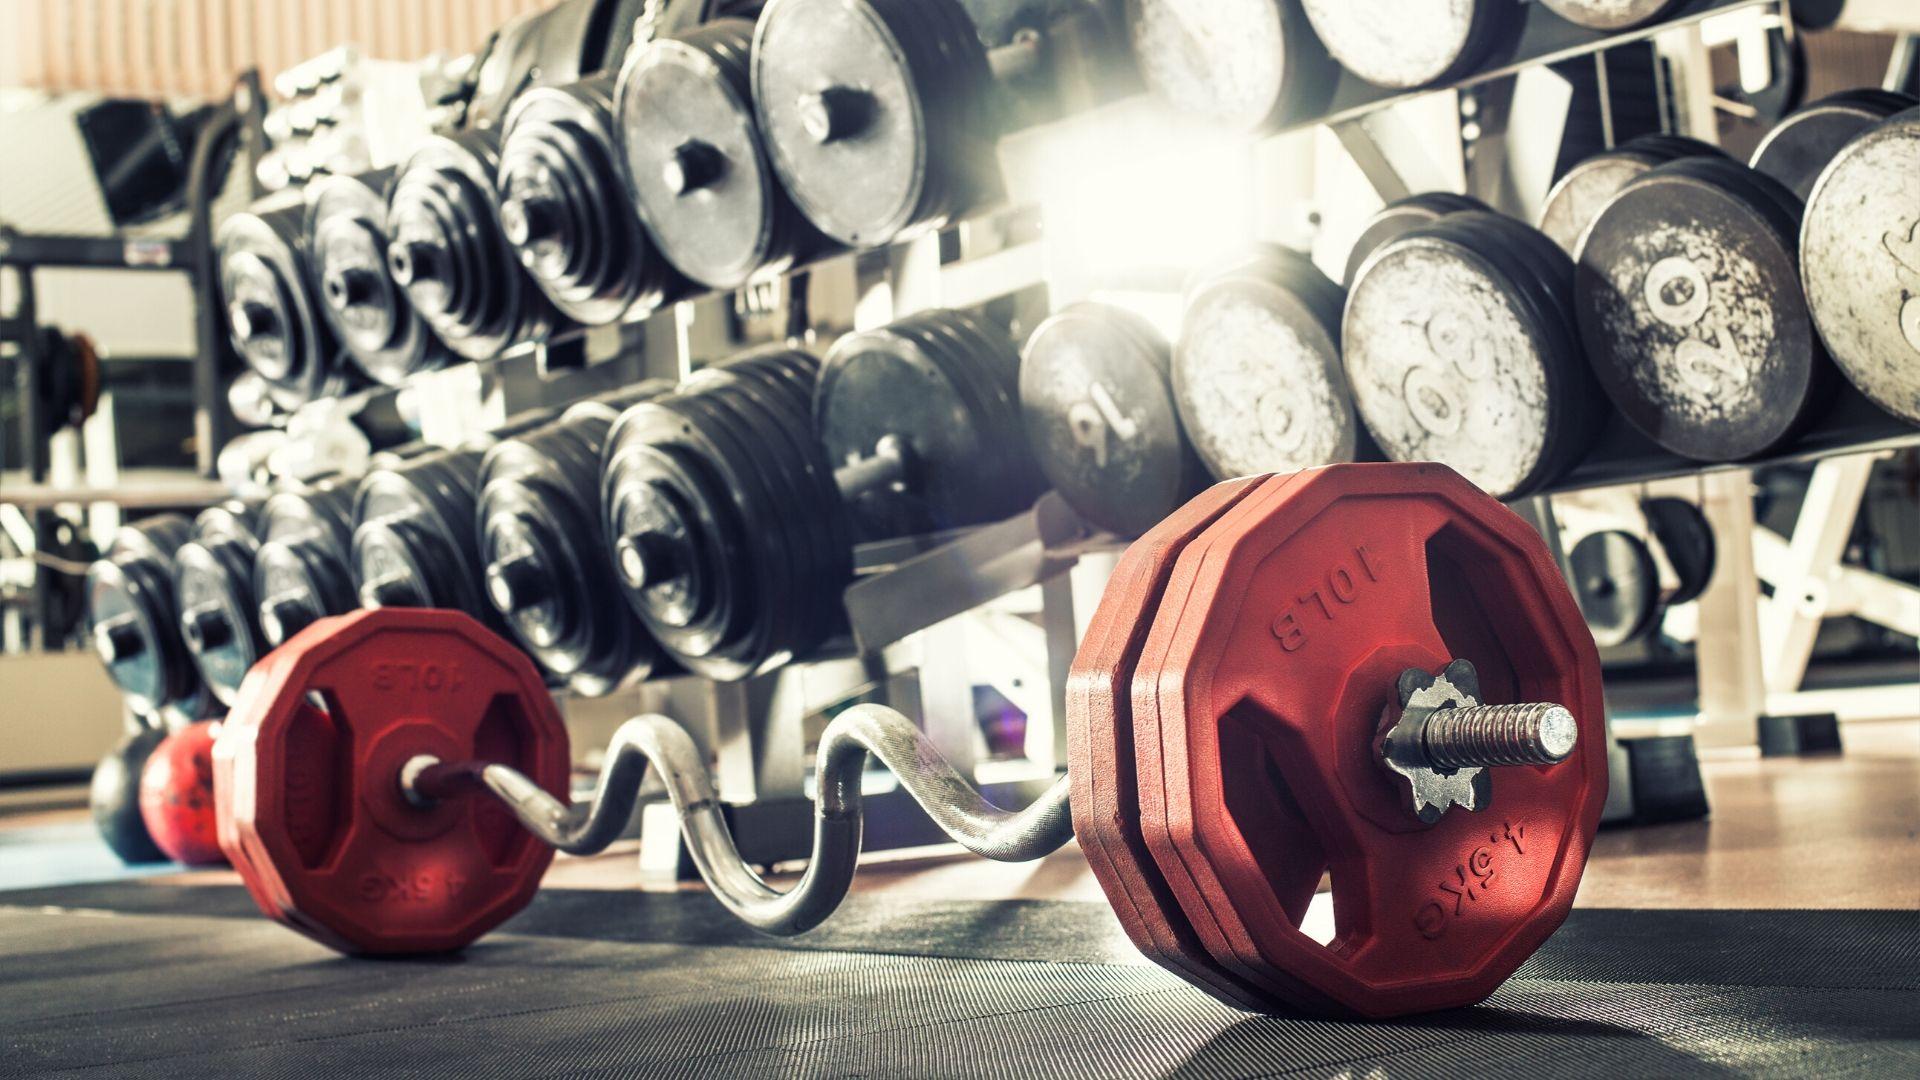 Save money on fitness